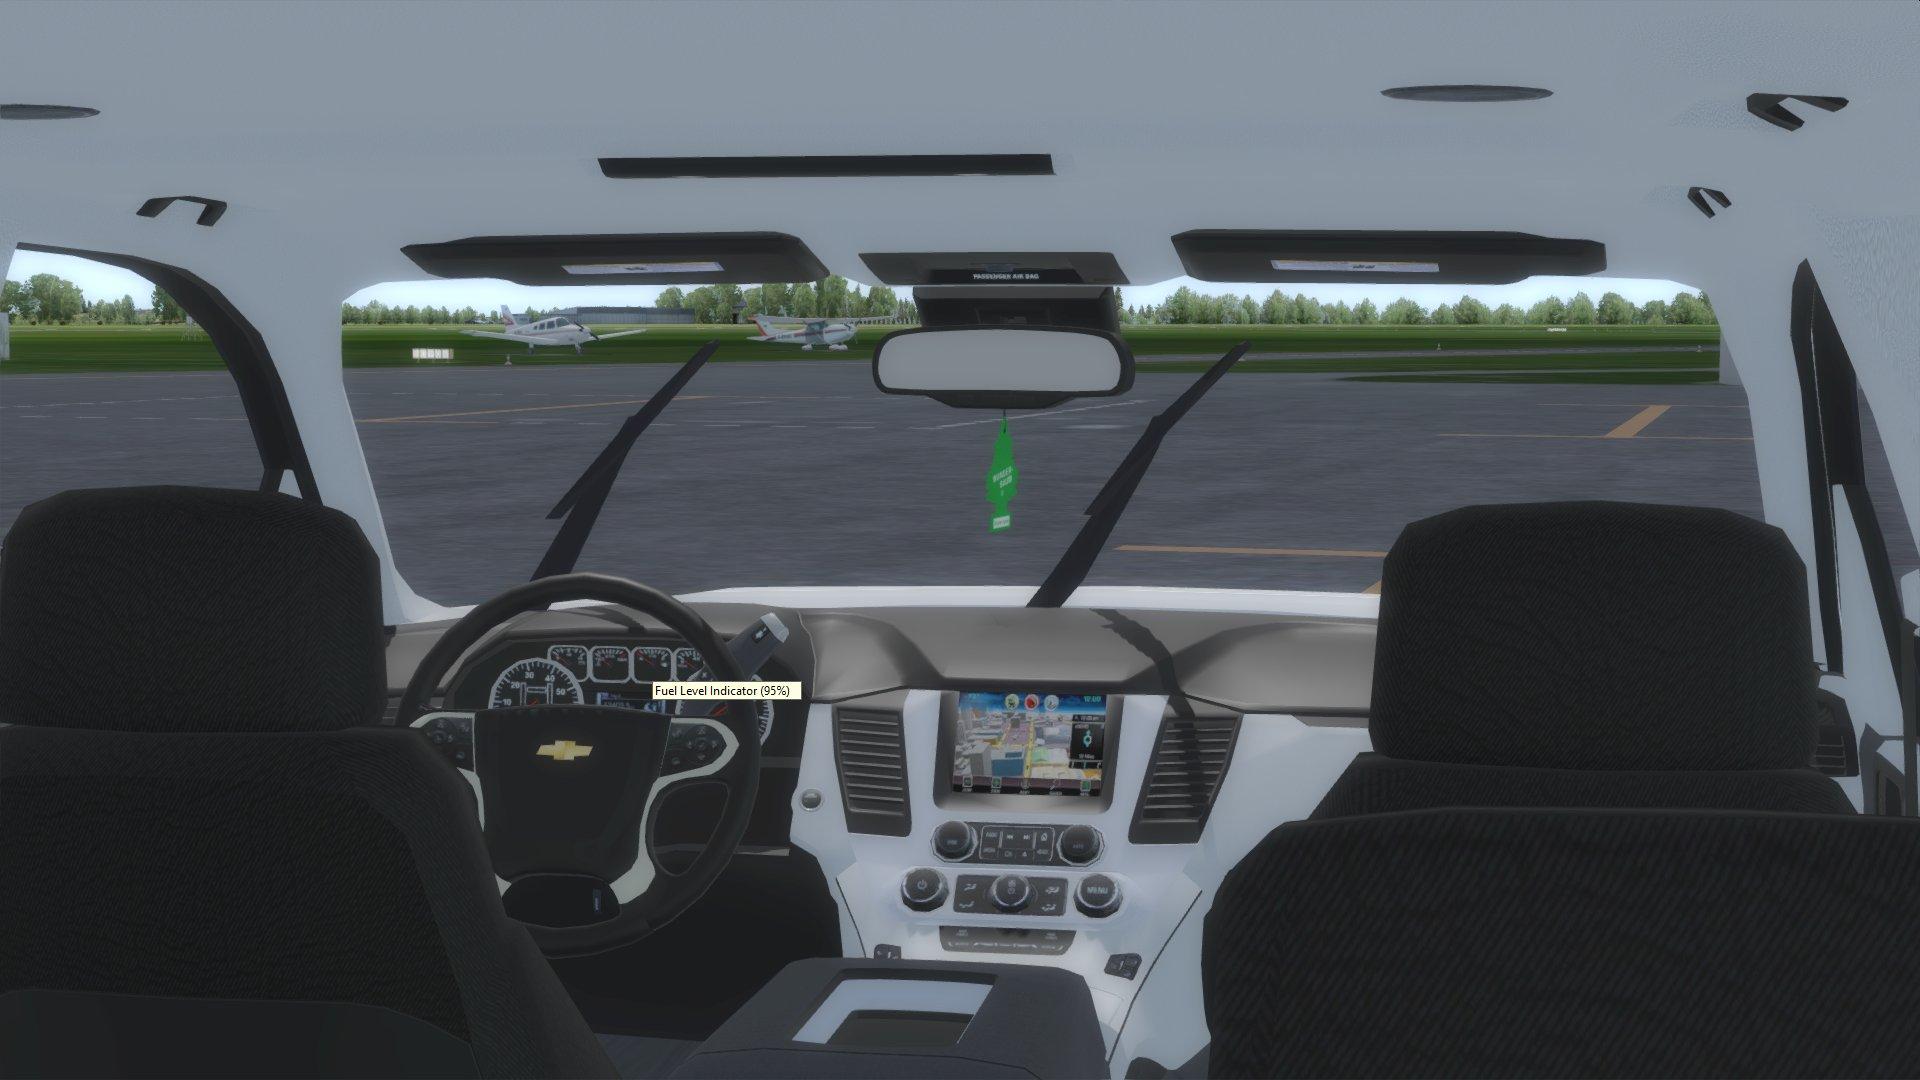 p3dv4_chevrolet_duftbaum_animiert_cockpit_gauges_tool_tips.jpg